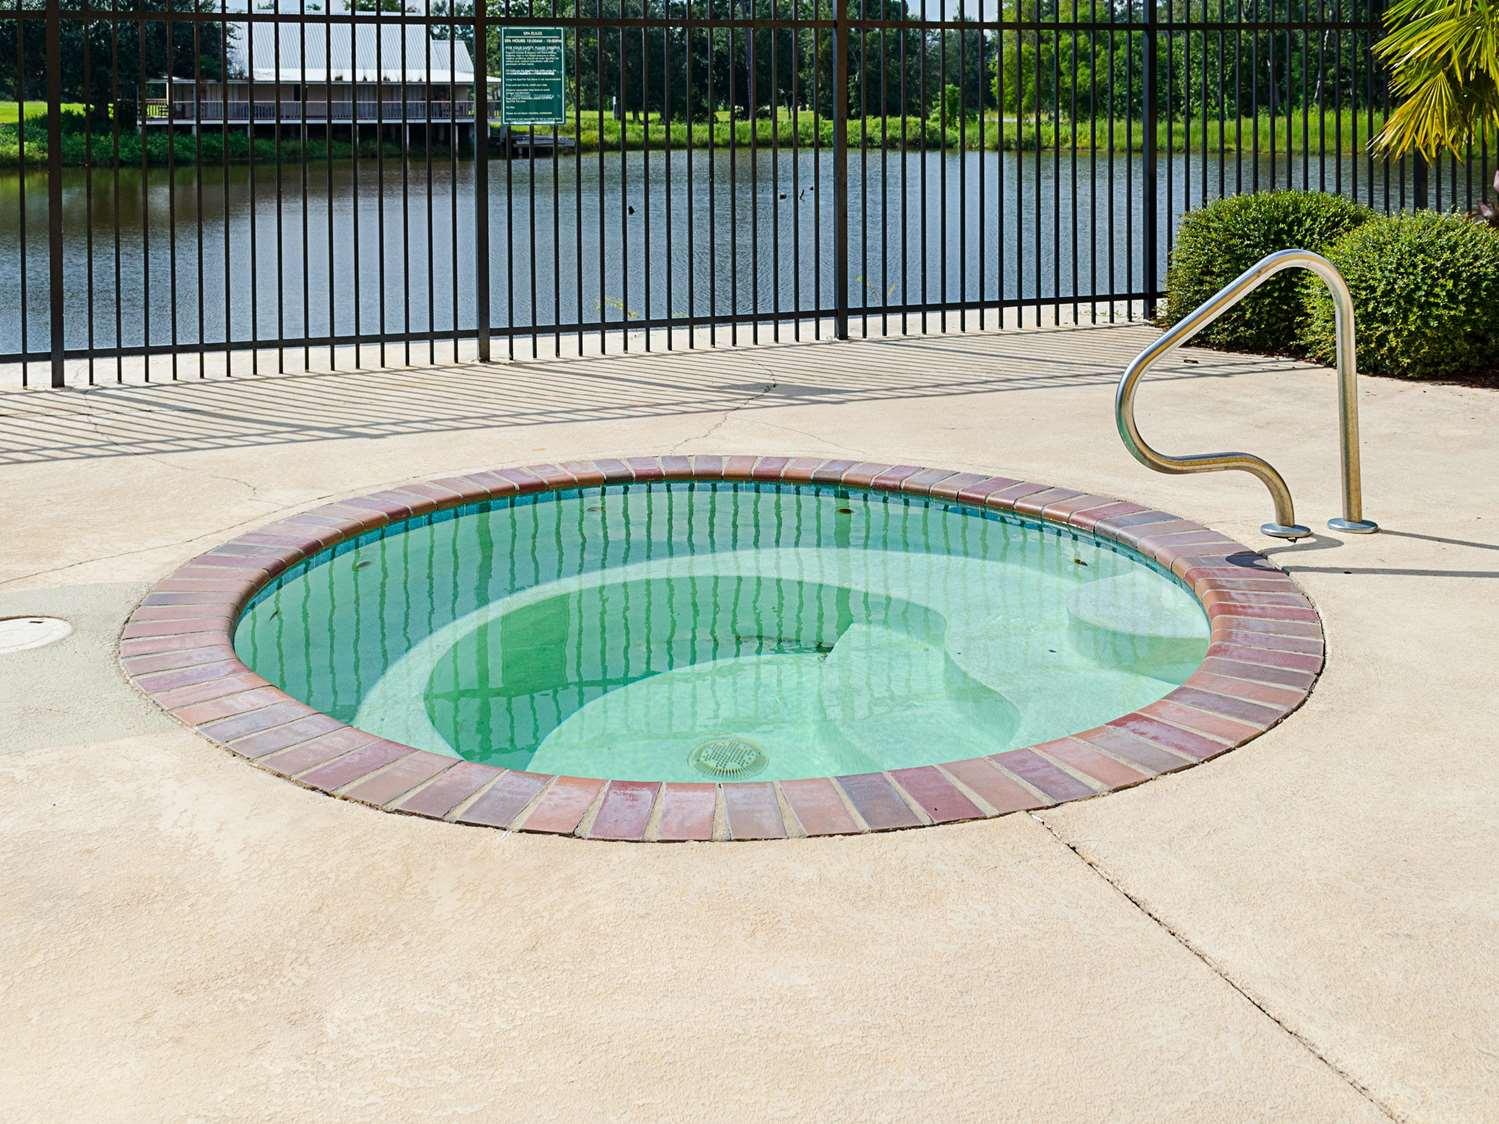 Pool - La Quinta Inn & Suites Biloxi